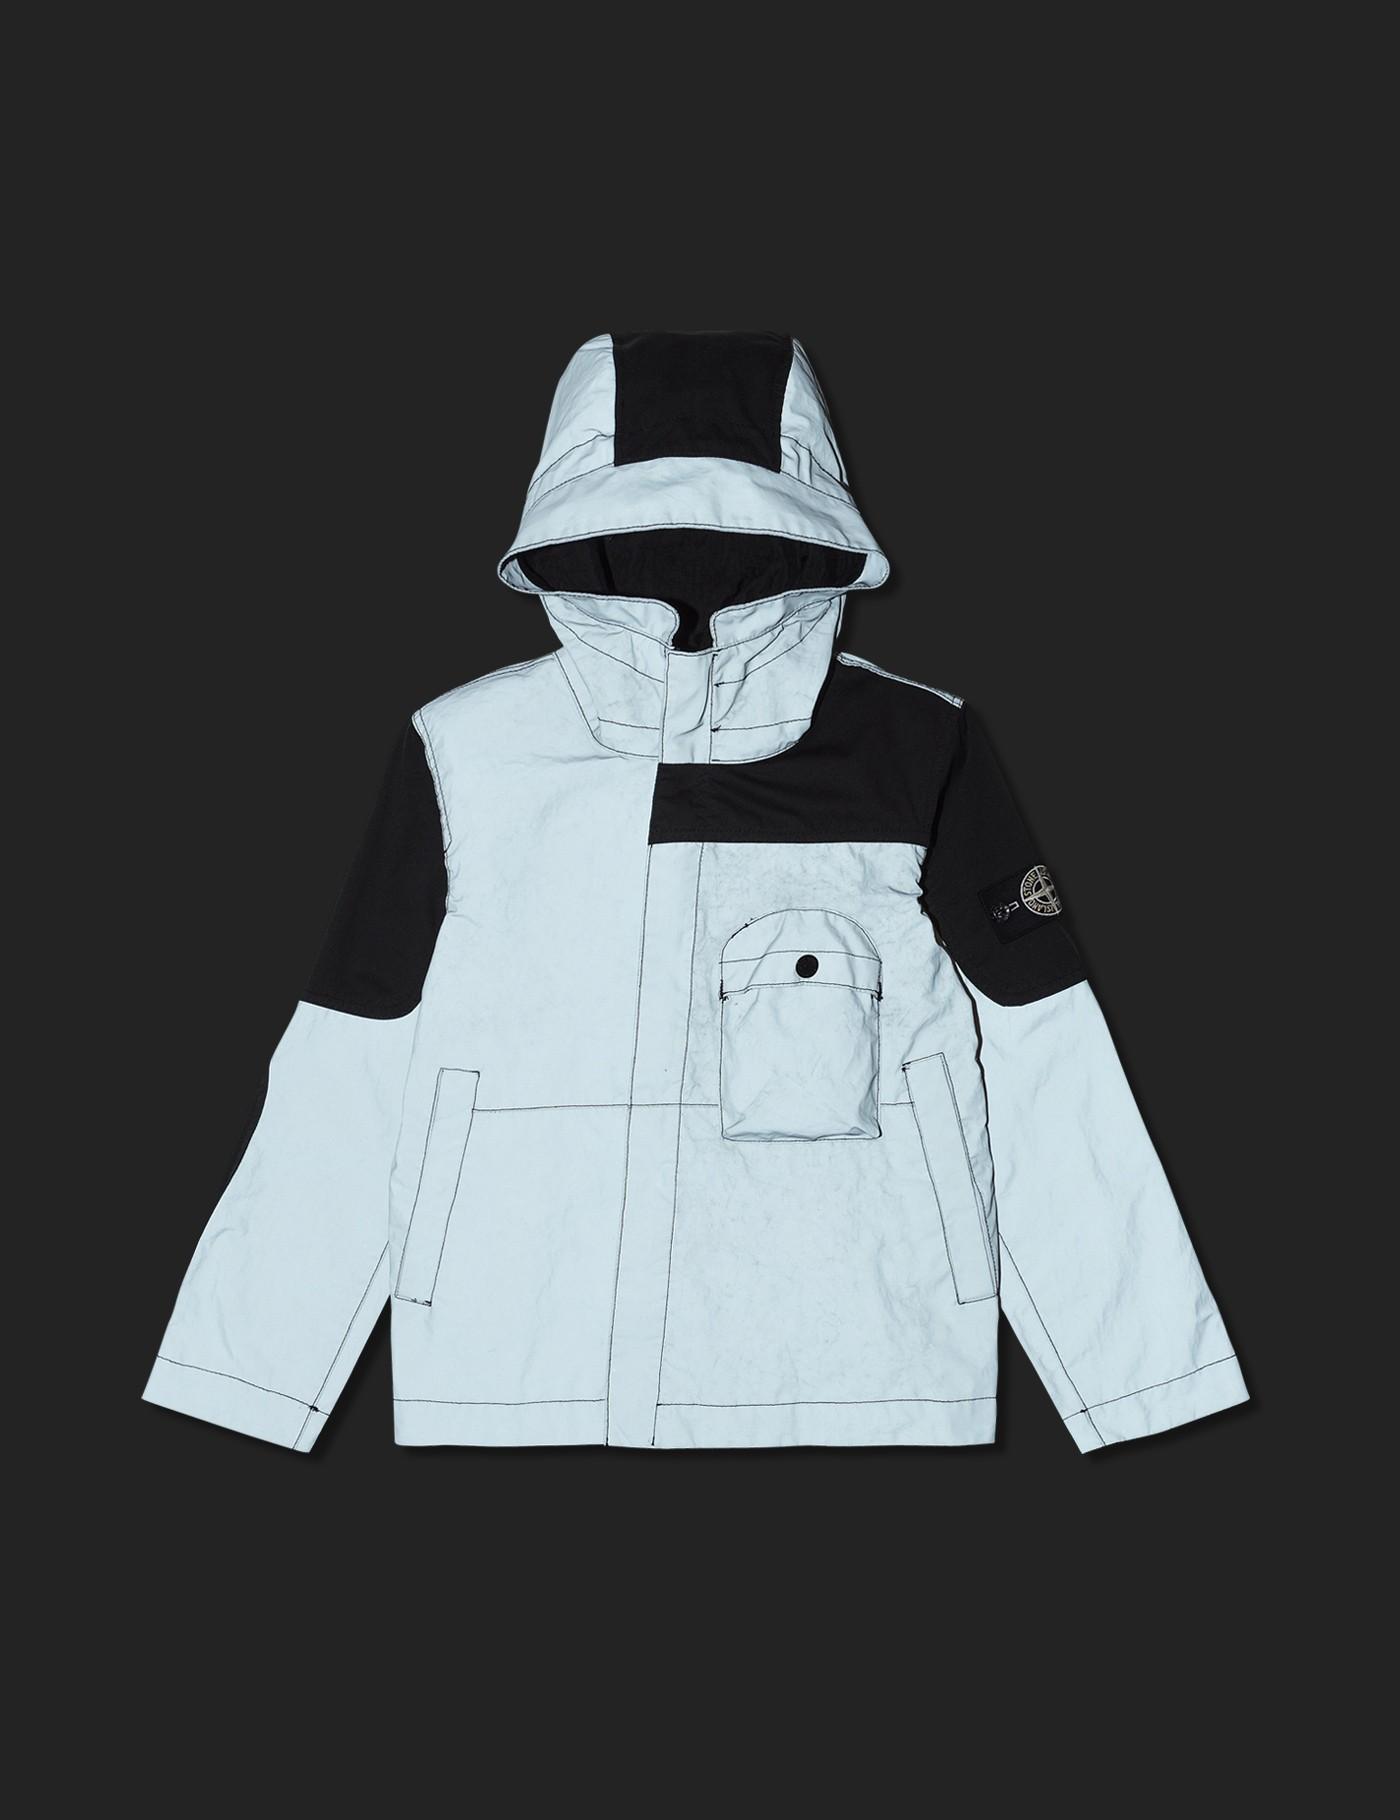 717438f2b Lyst - Stone Island Jackets (kid) in Black for Men